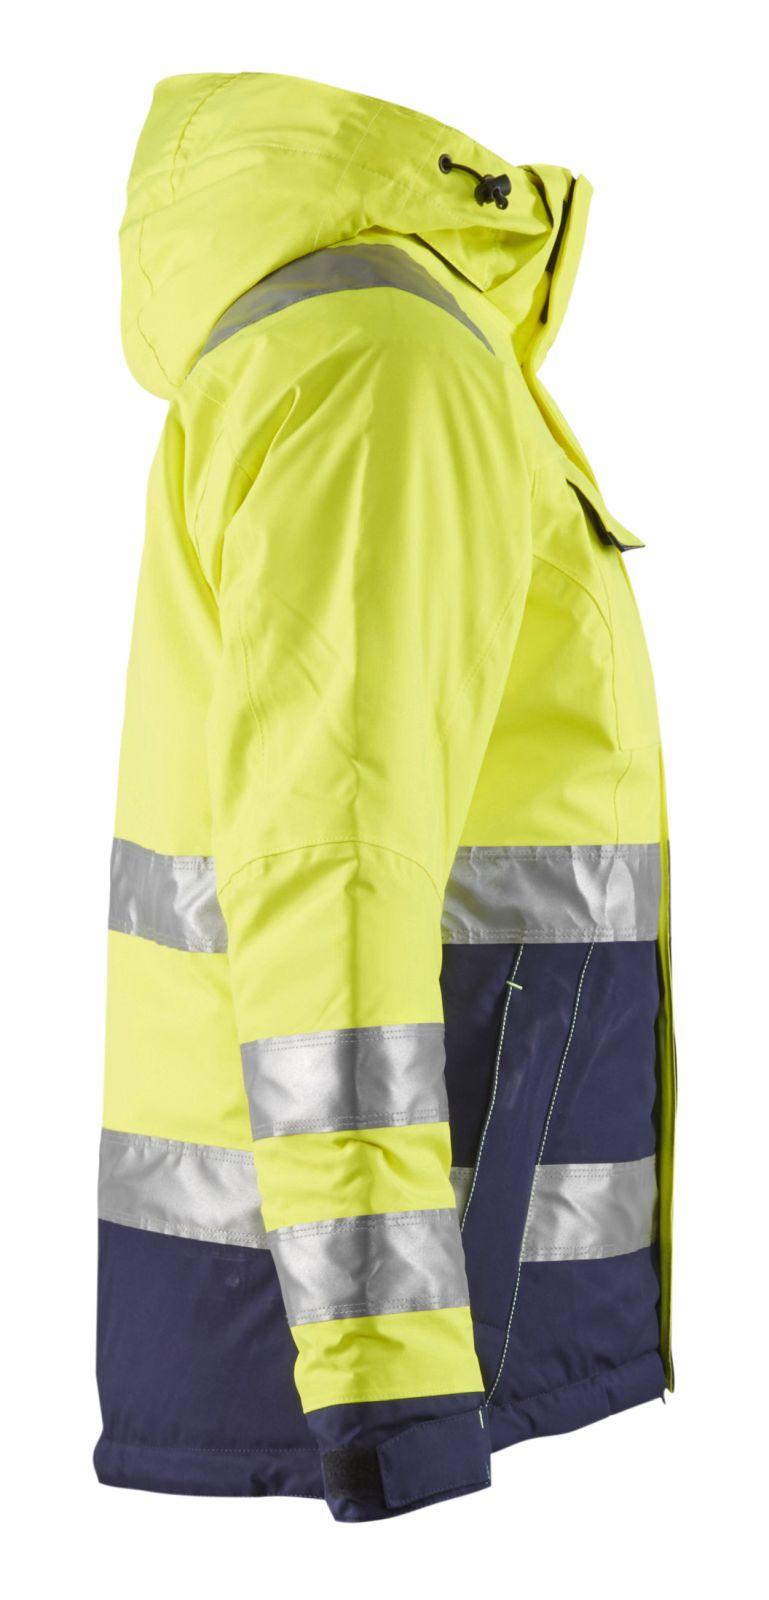 Blaklader Dames winterjacks 48721987 High Vis geel-marineblauw(3389)